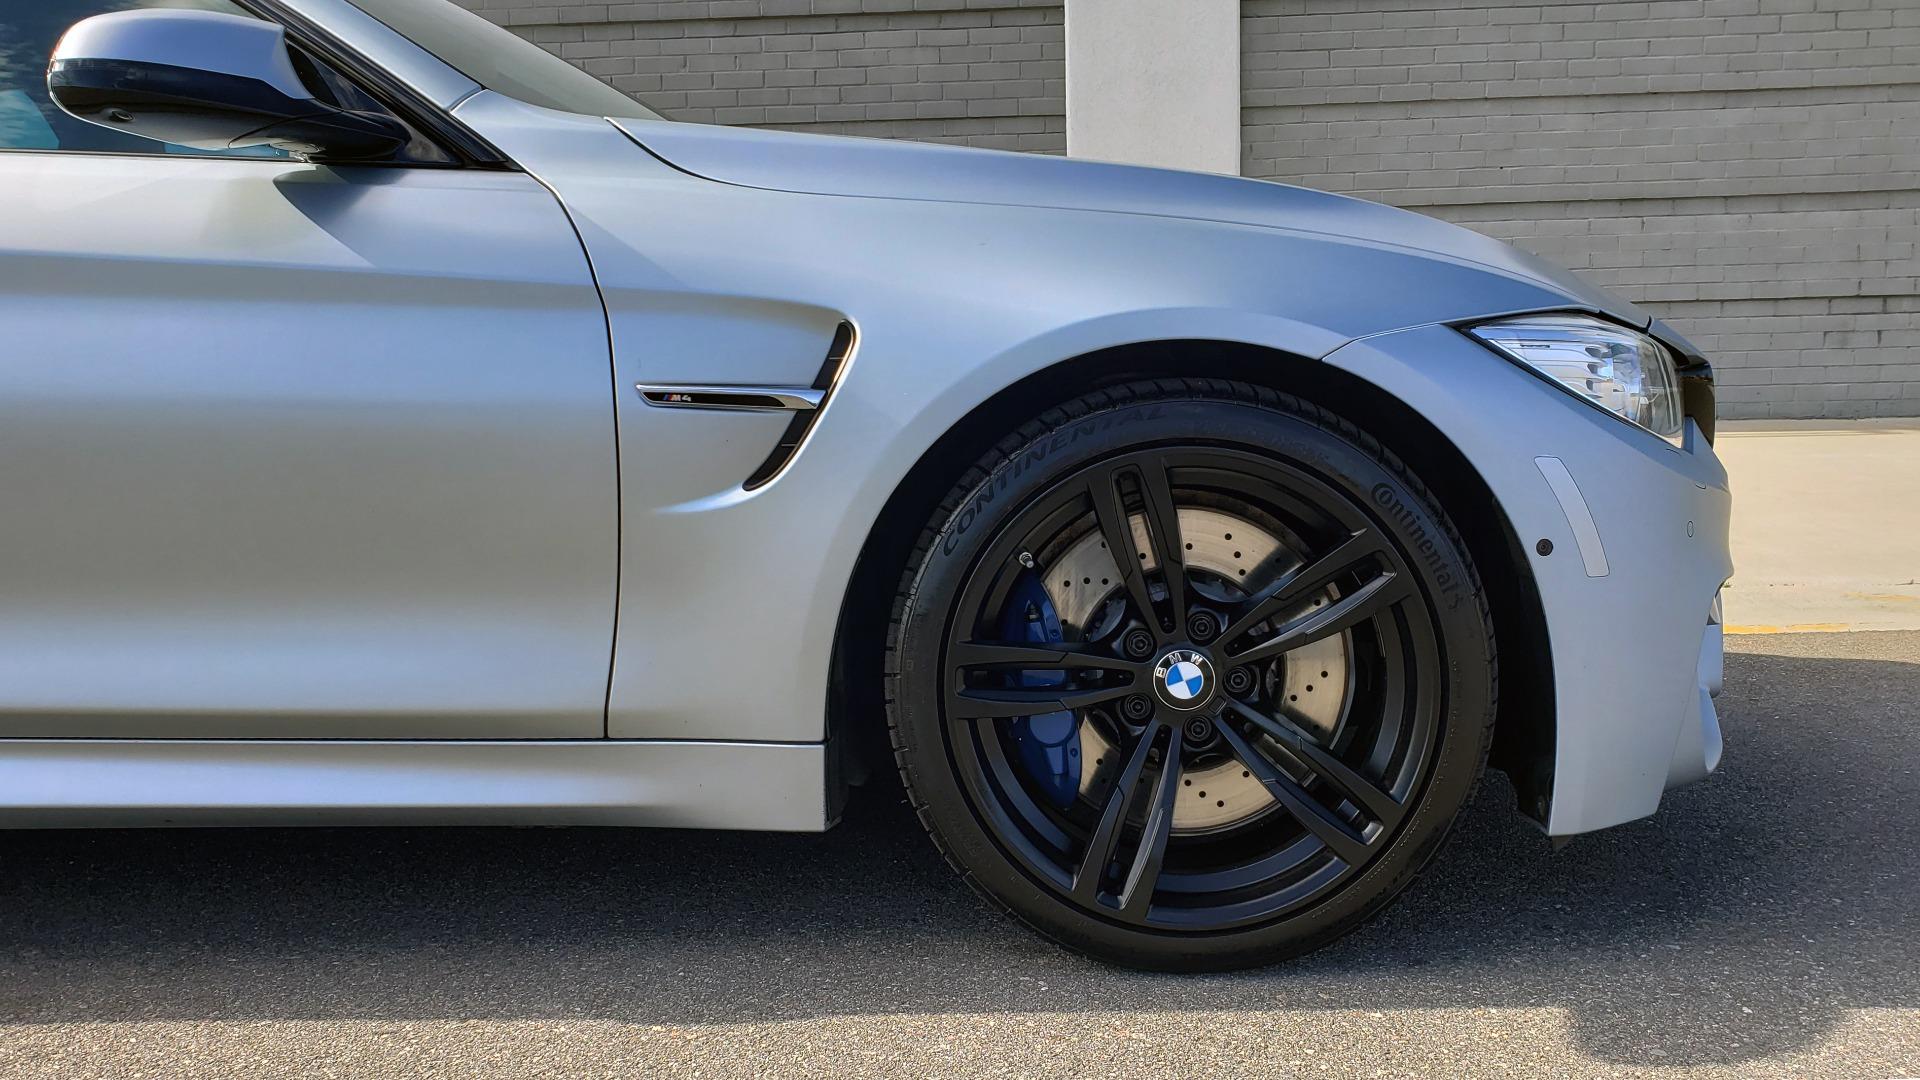 Used 2015 BMW M4 COUPE / EXEC PKG / DRVR ASST PLUS / LIGHTING / M-SUSPENSION for sale Sold at Formula Imports in Charlotte NC 28227 83